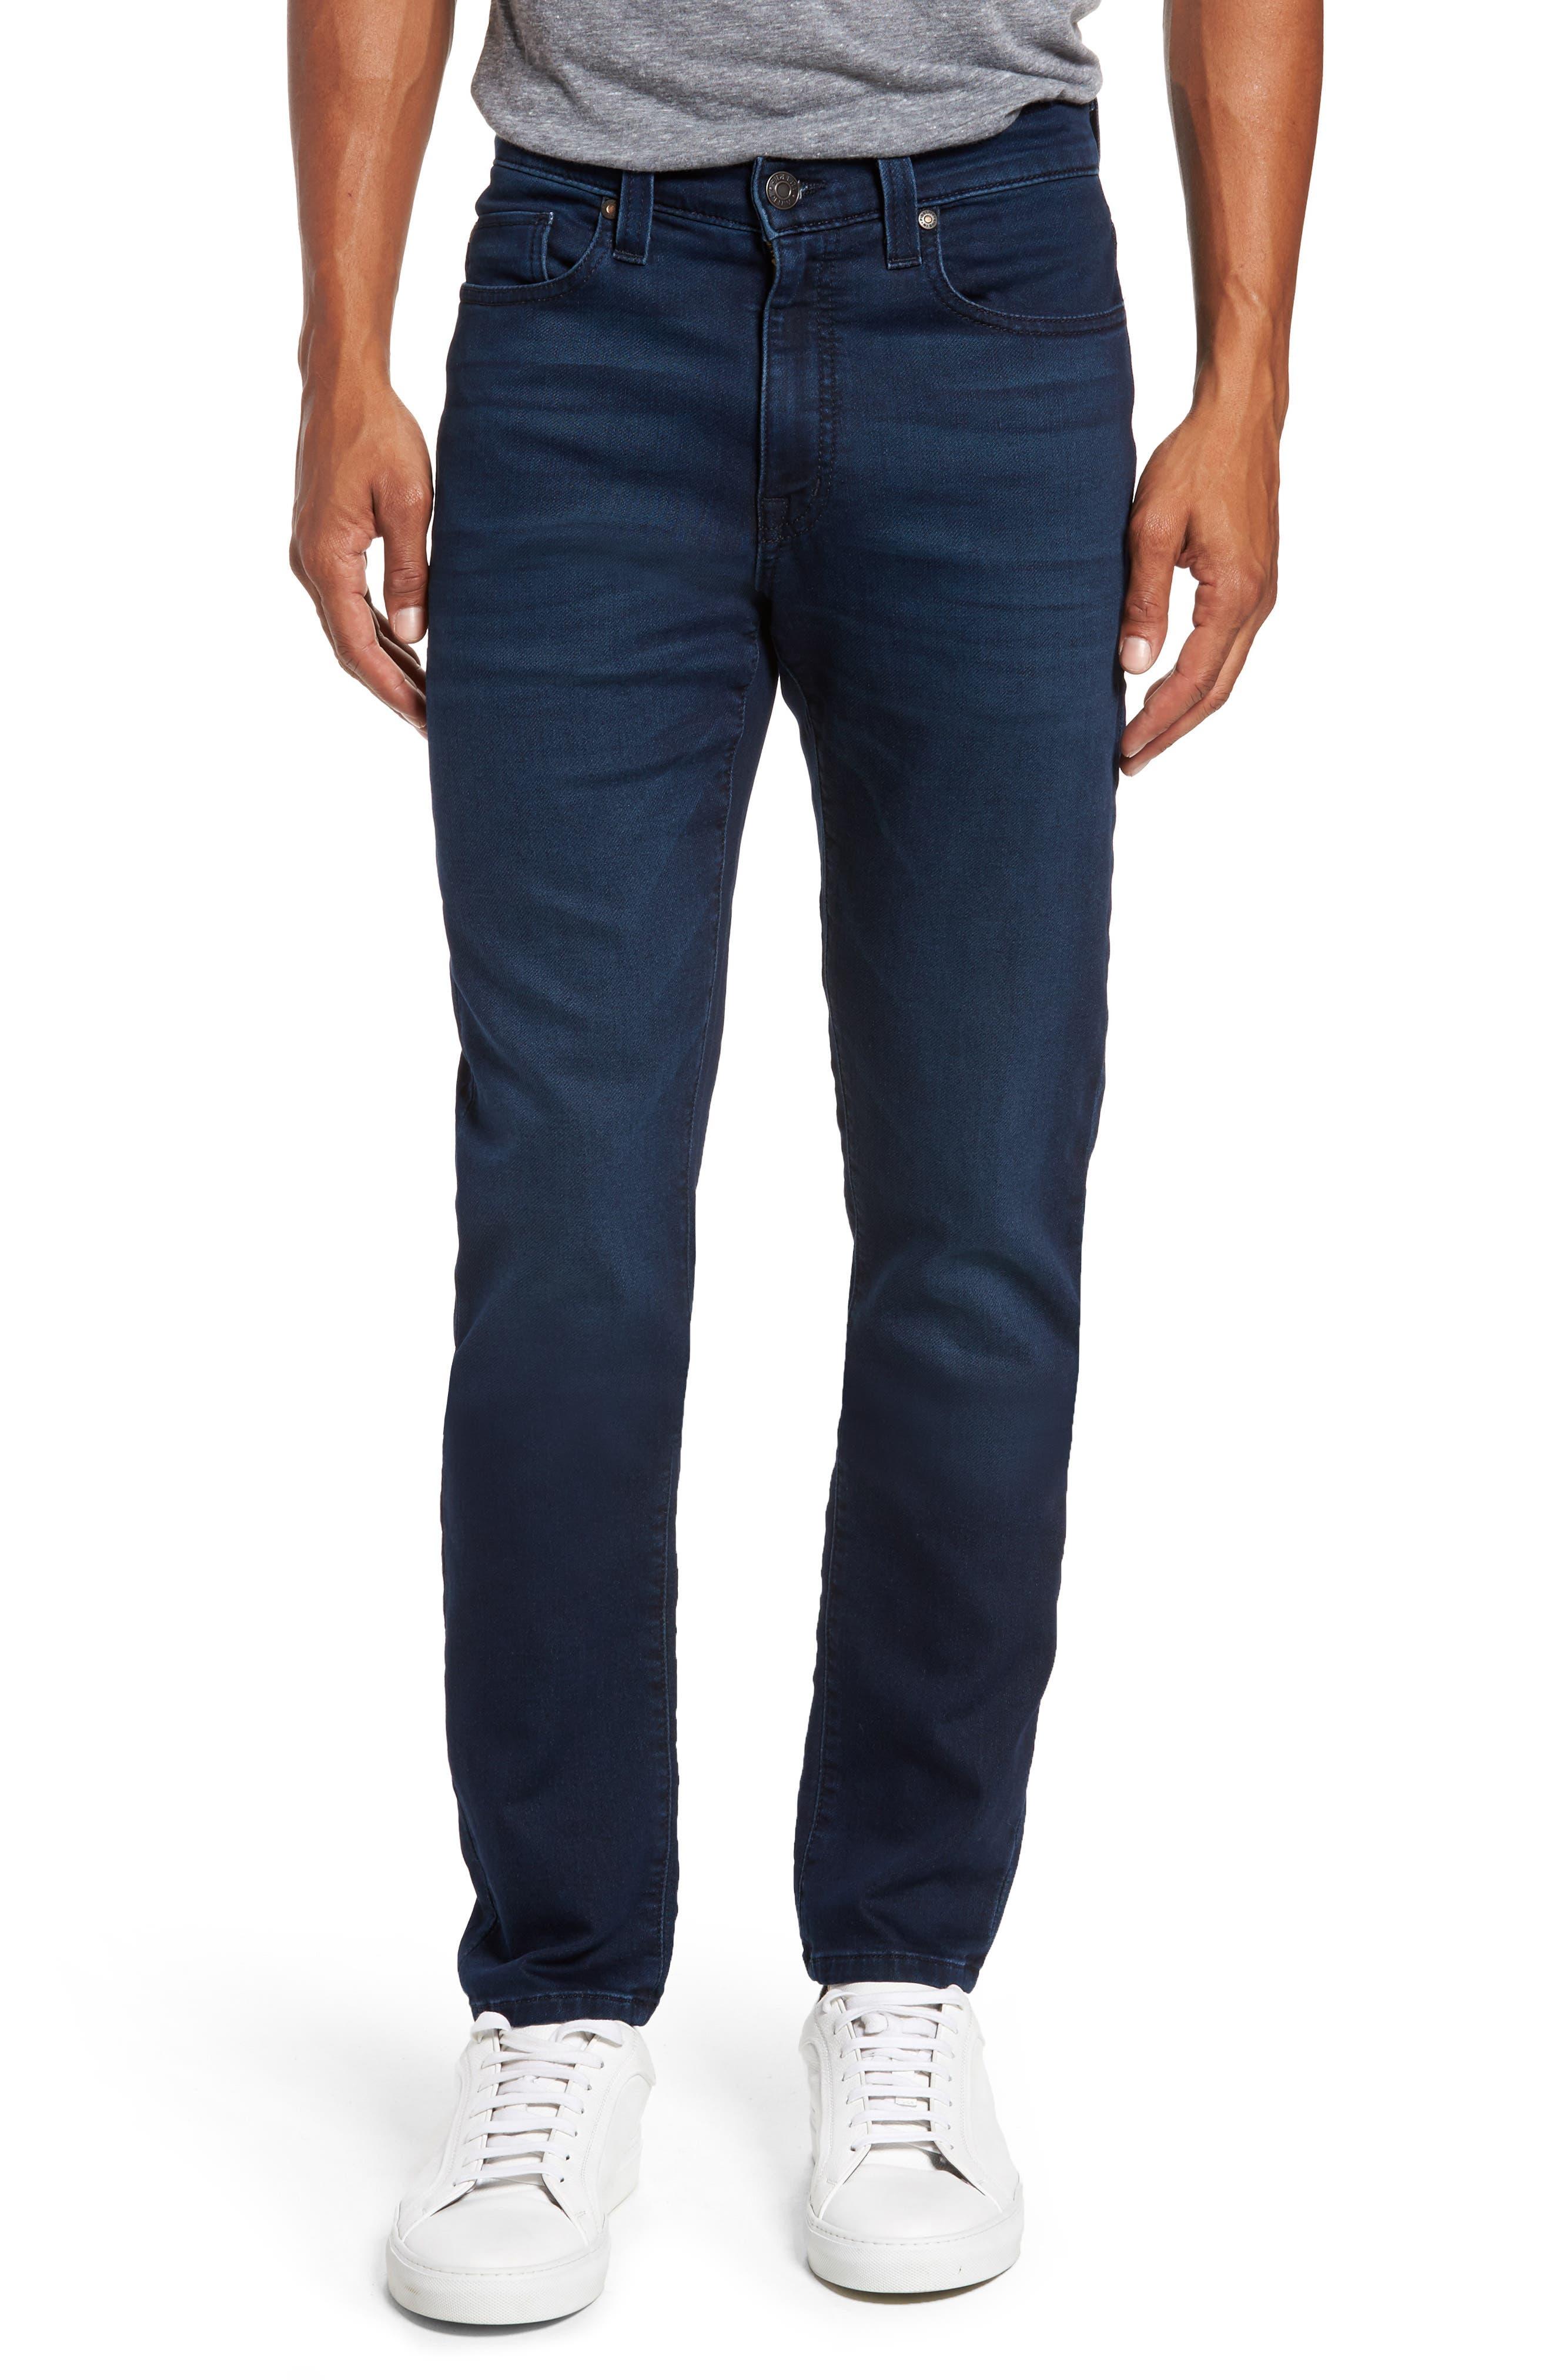 Torino Slim Fit Jeans,                             Main thumbnail 1, color,                             Lemmy Blue